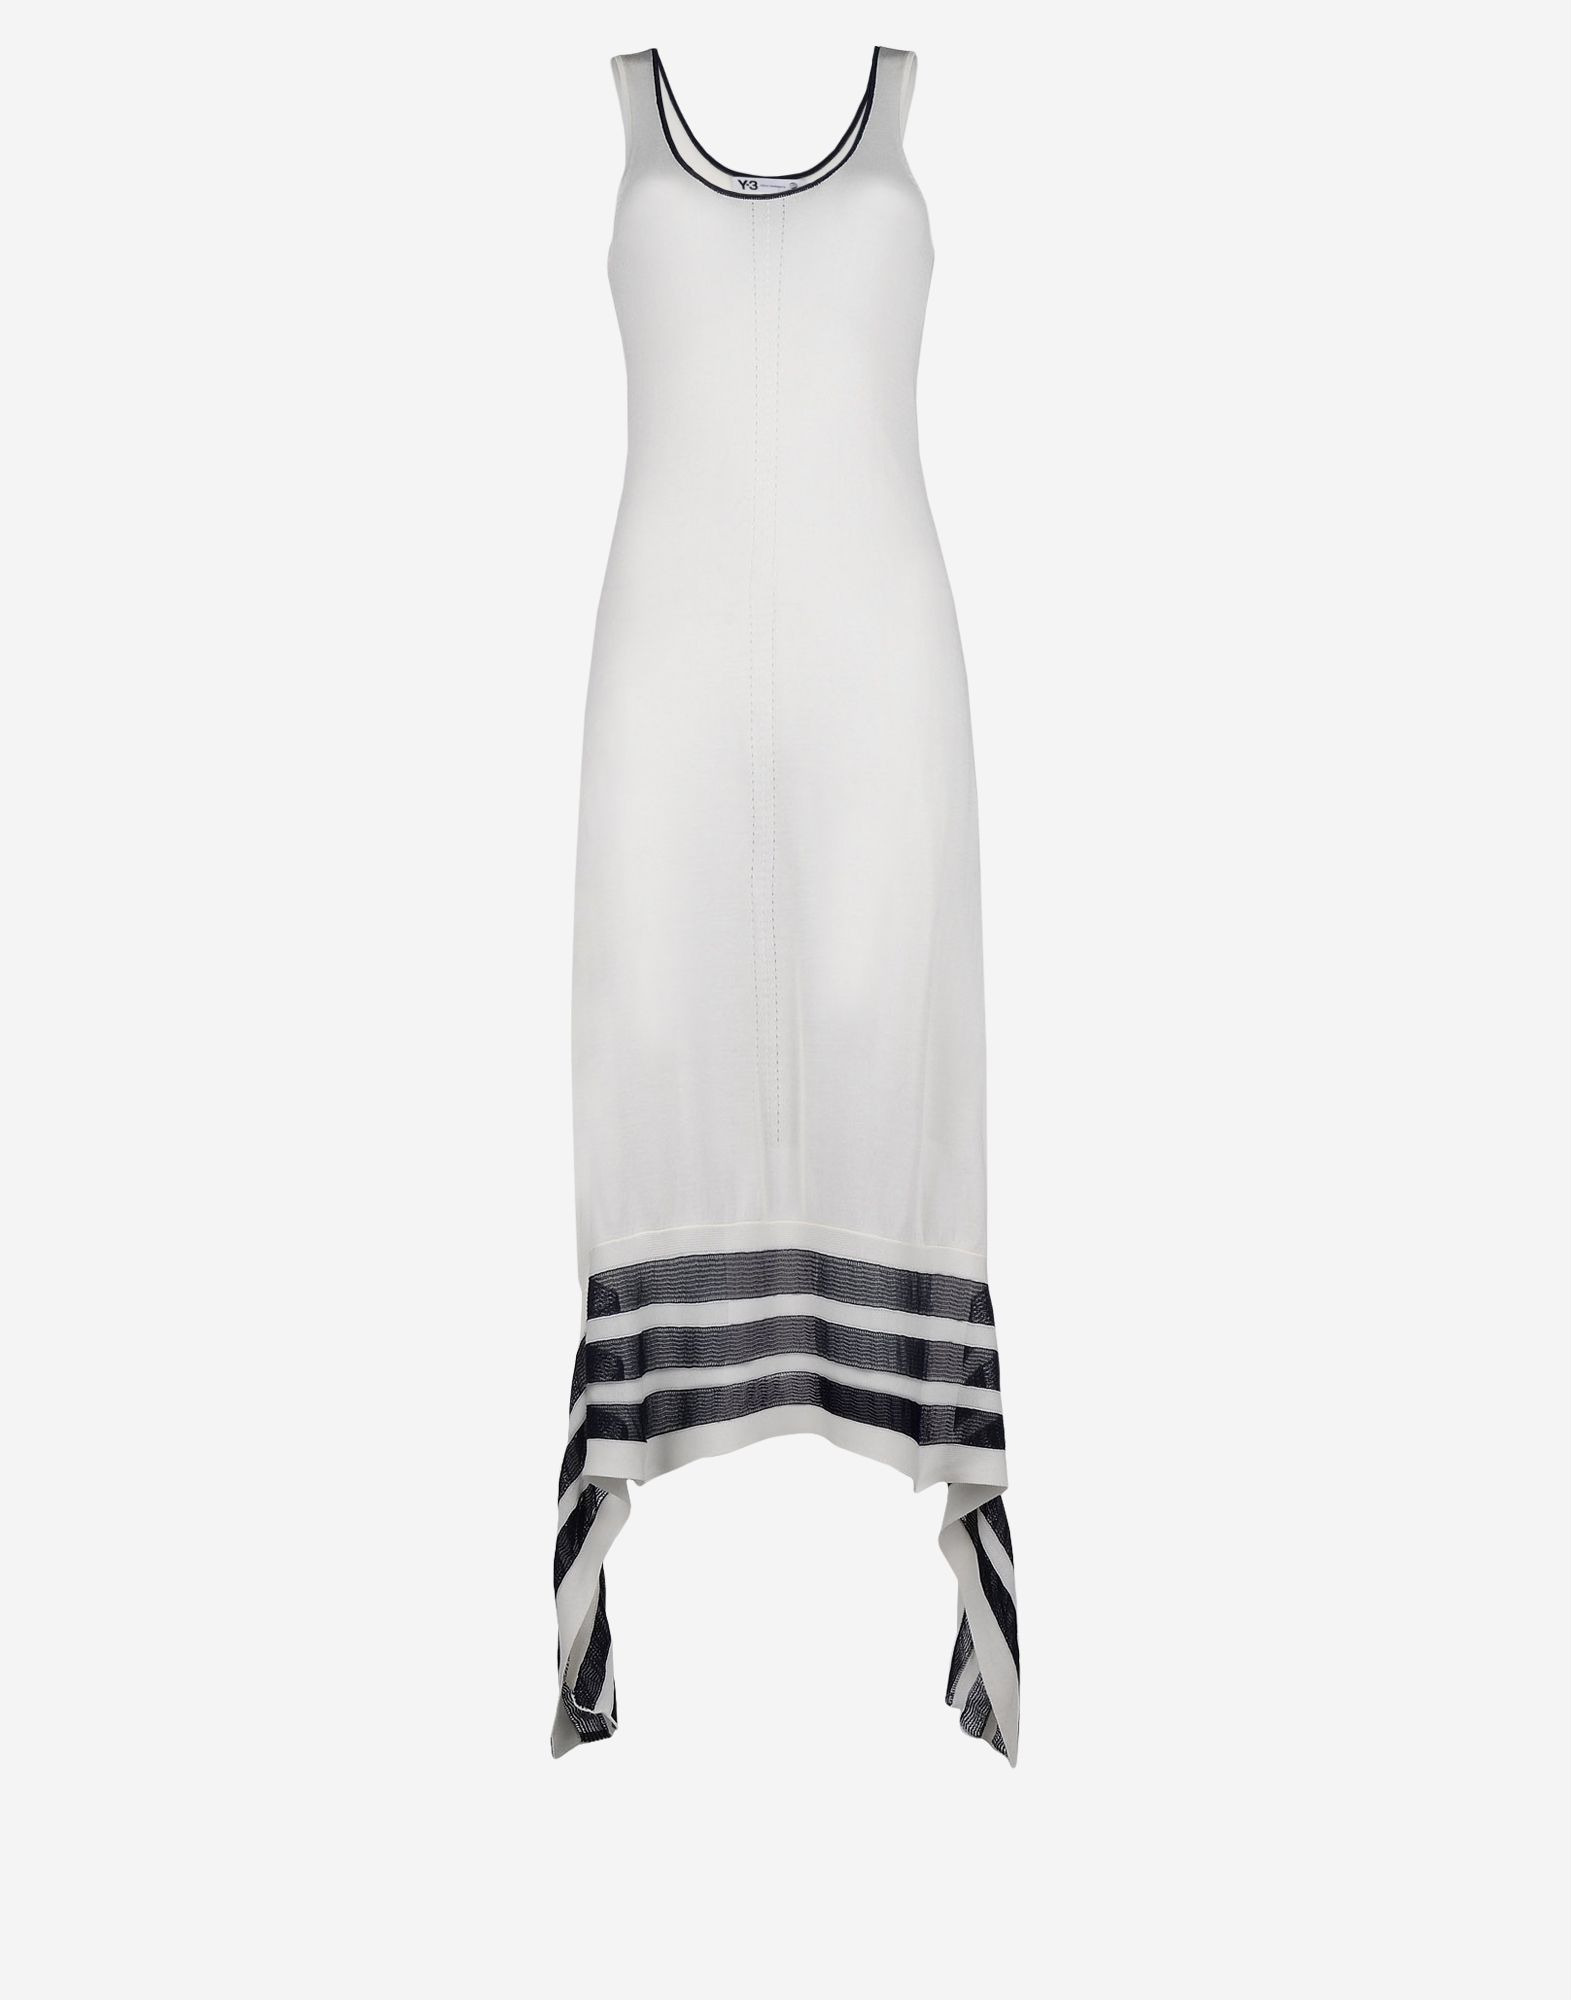 Y3 3 Knit 3 Mujeres Stripes Knit Dress para Mujeres | ef14c53 - hotlink.pw